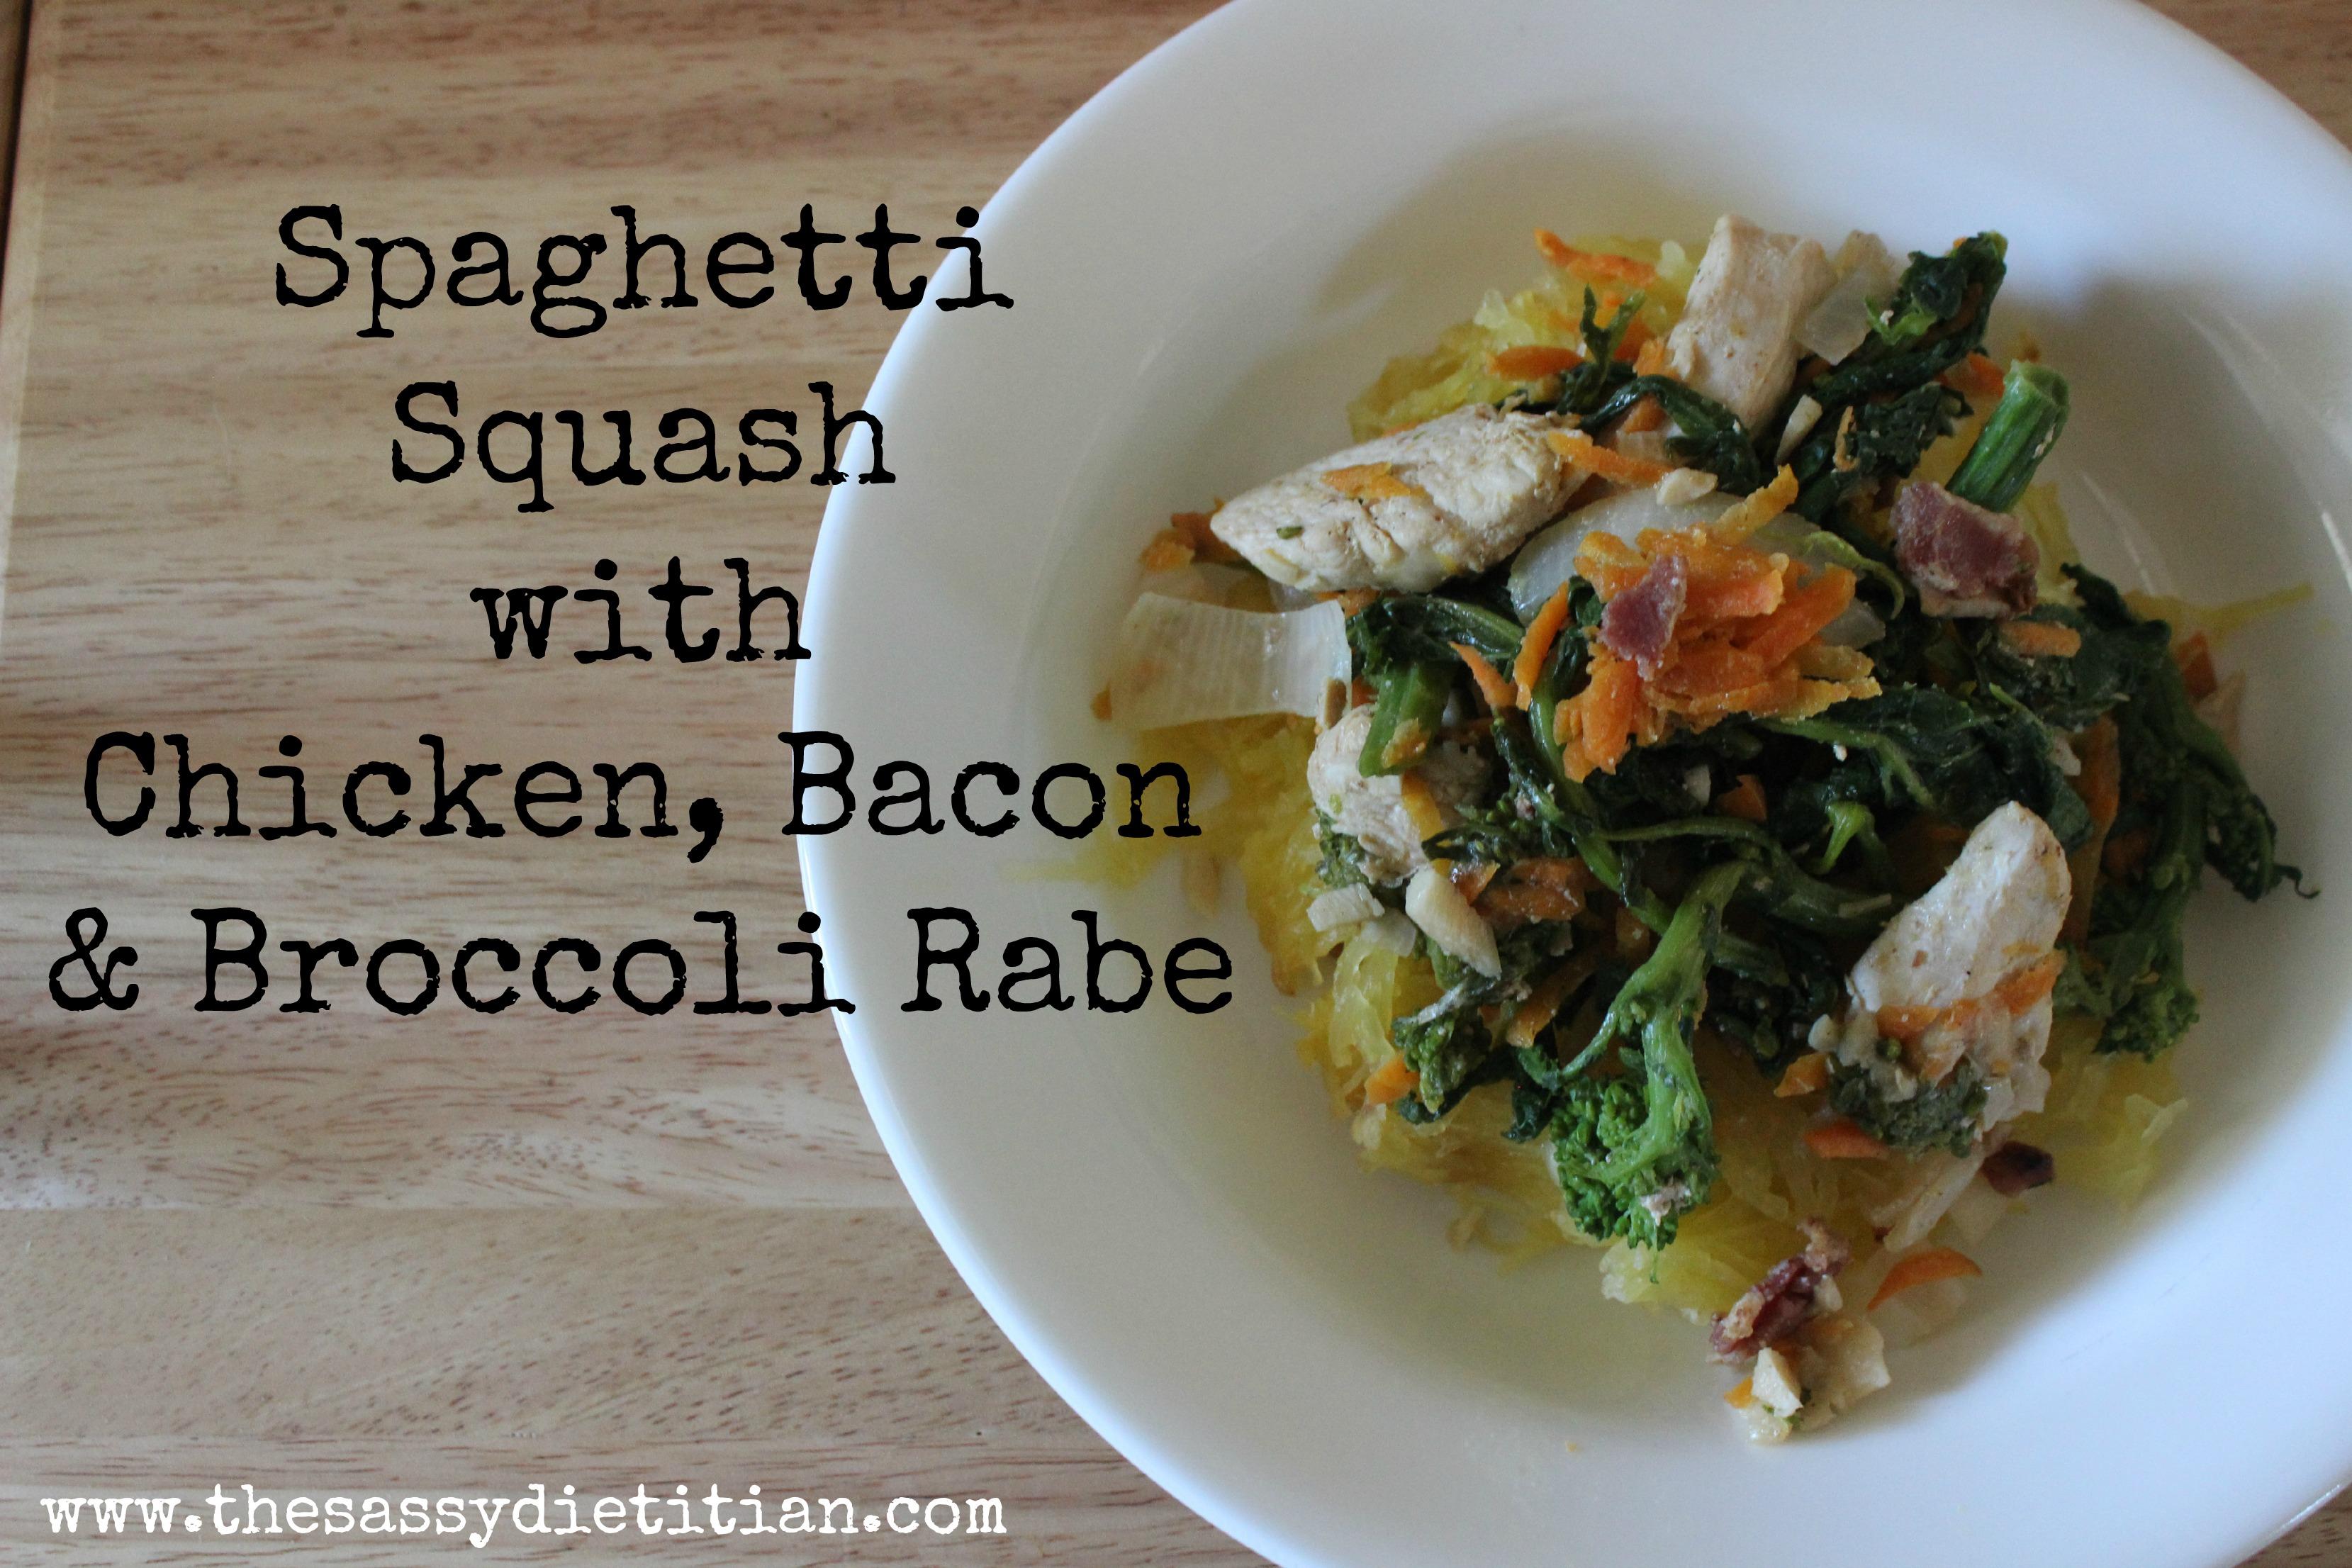 Spaghetti Squash Broccoli Rabe